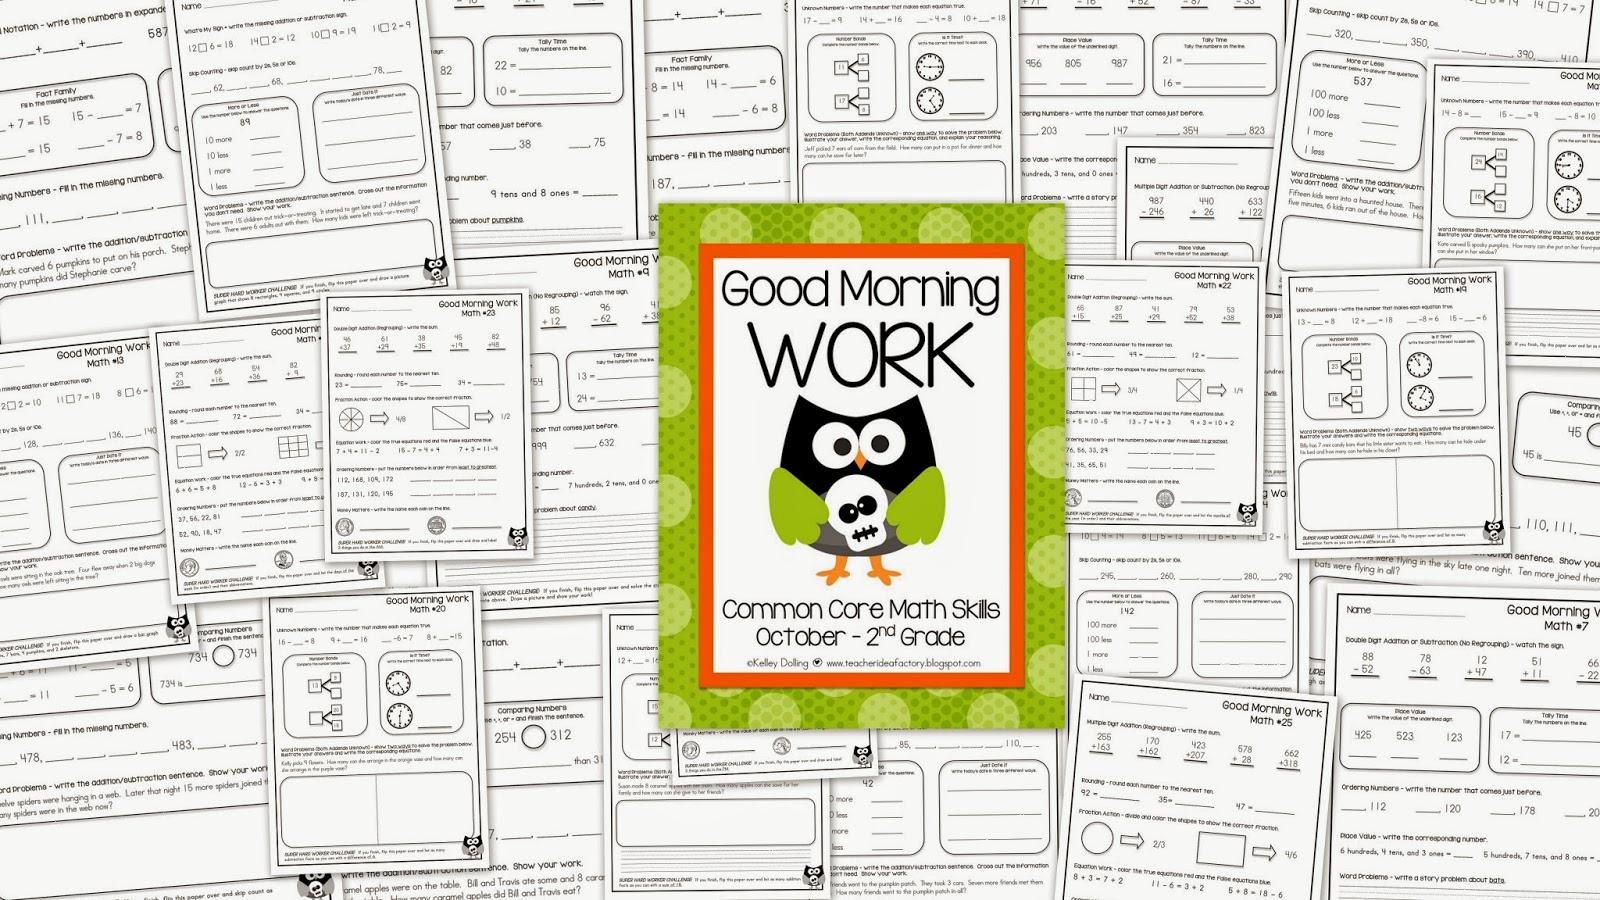 THE HAPS + MORNING WORK + IDEAS/FREEBIES - Teacher Idea Factory